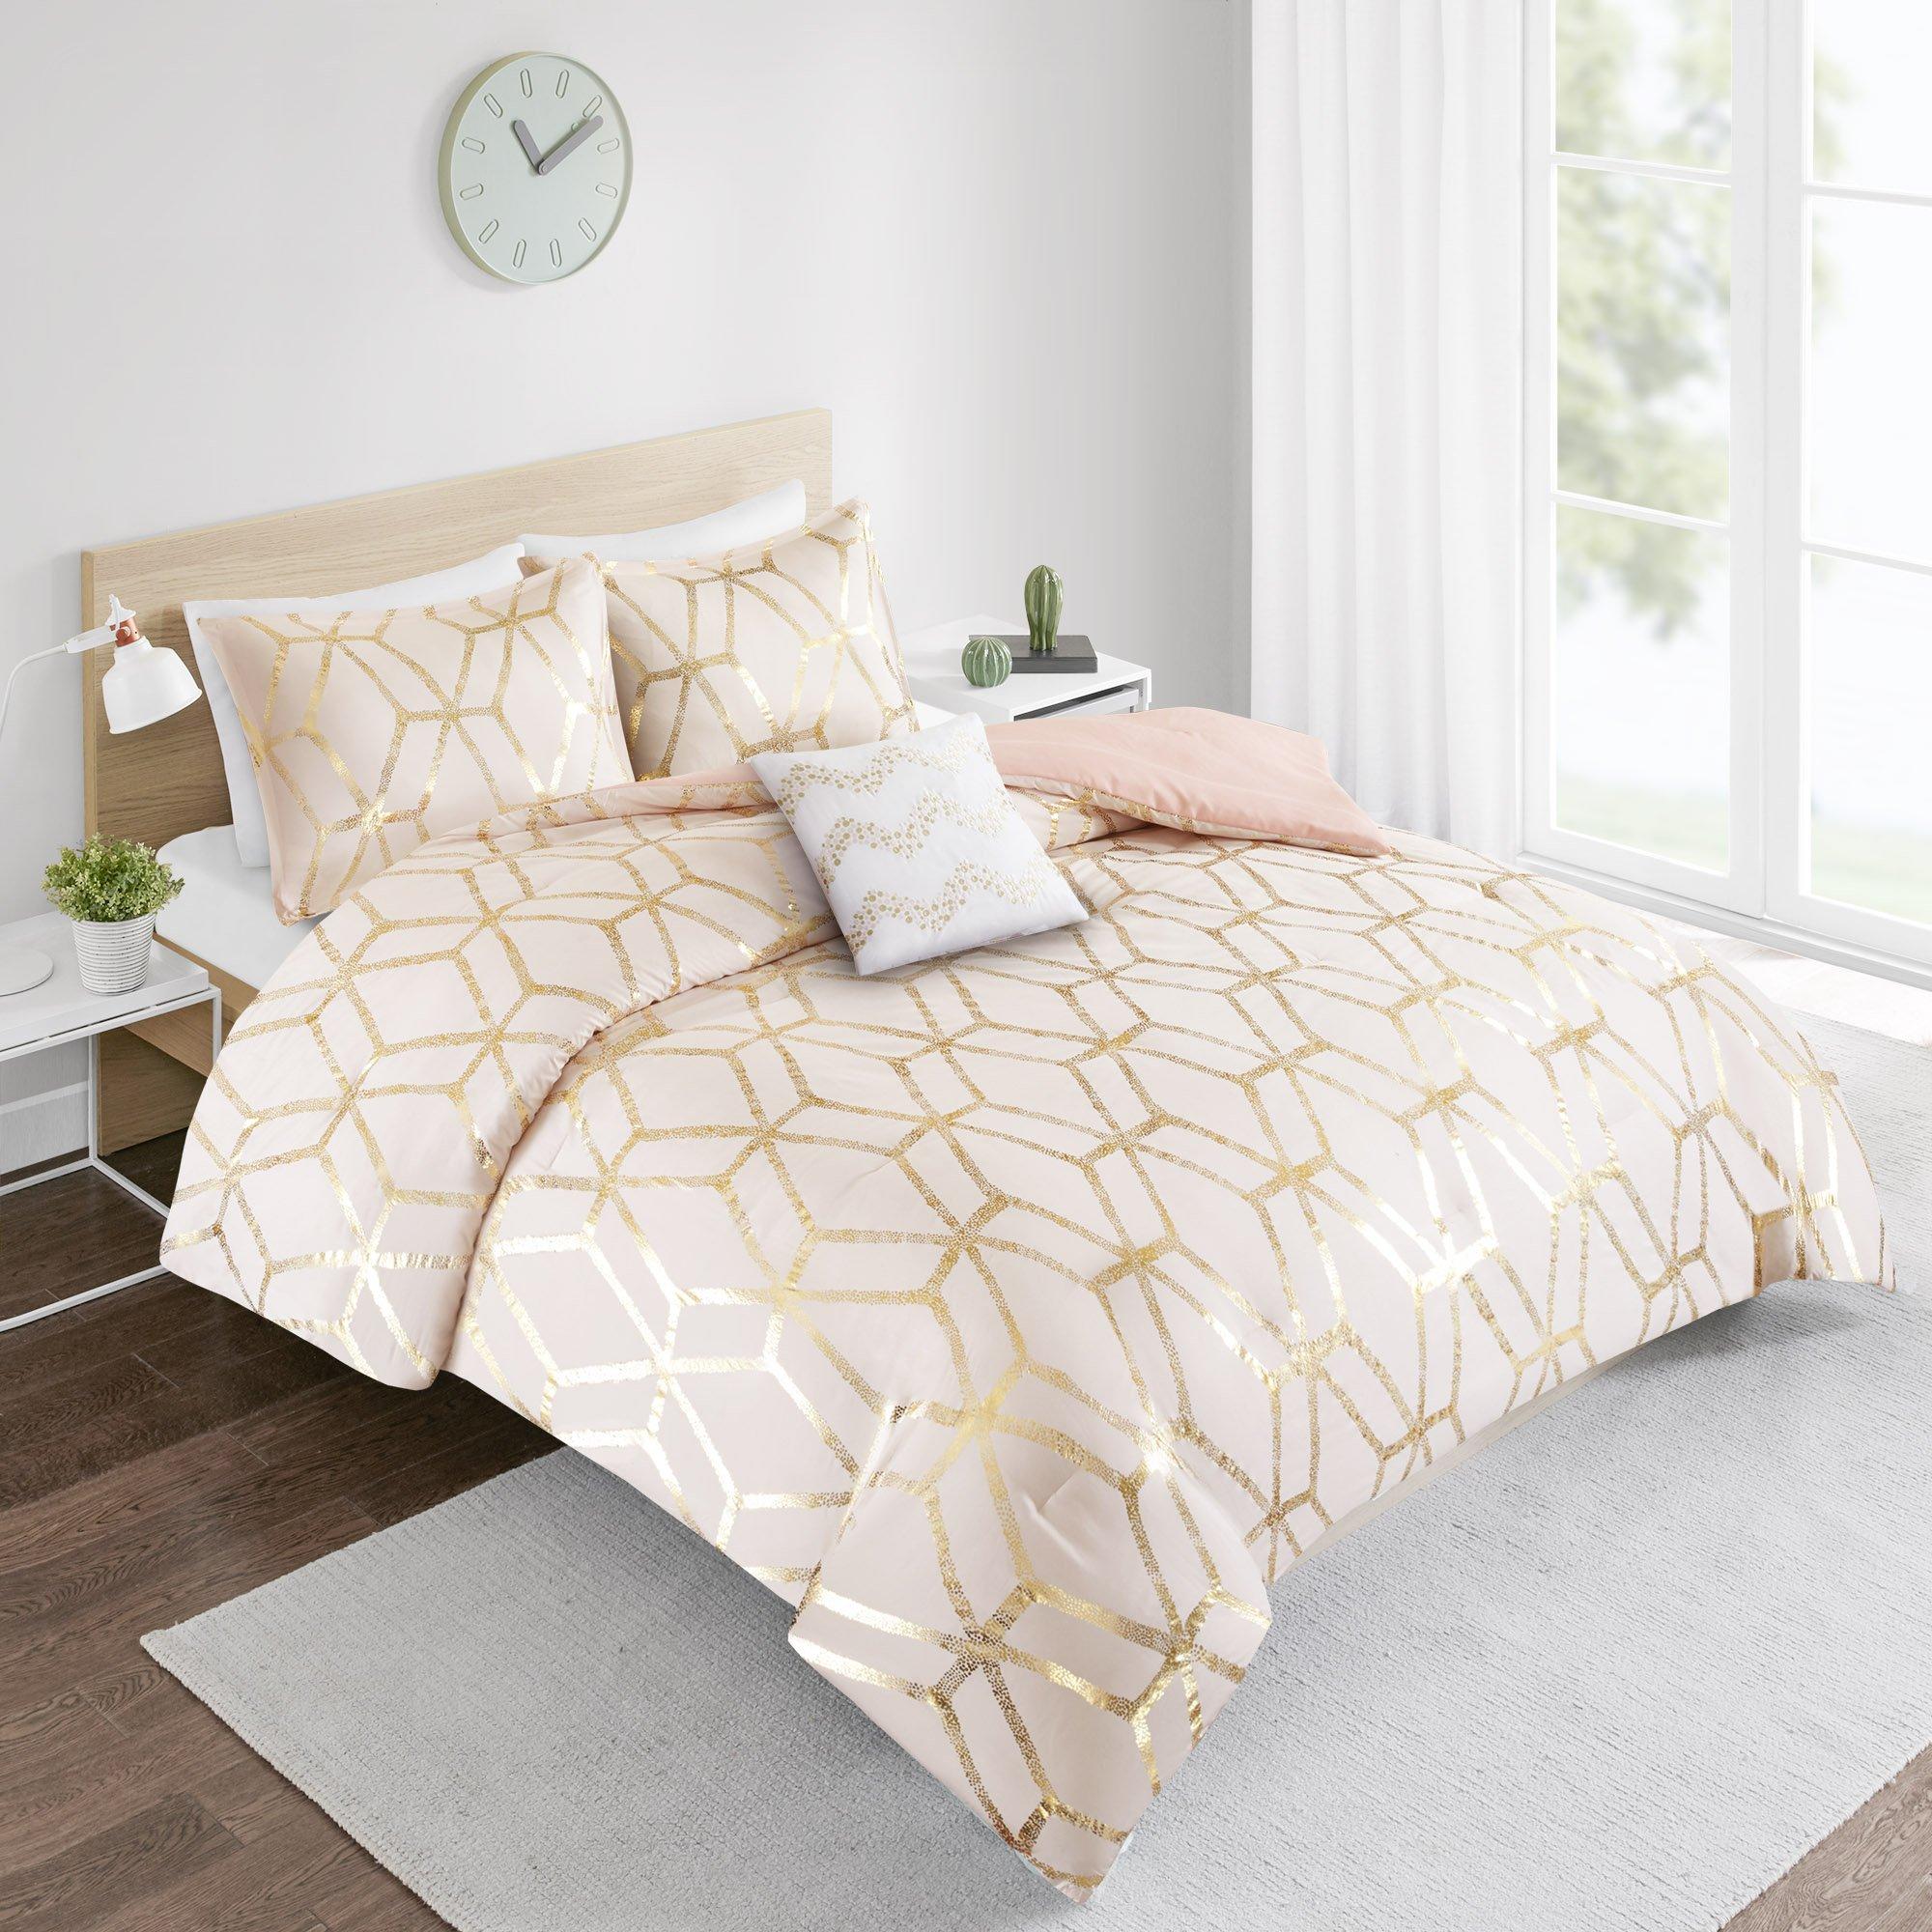 Comforter Set Twin Bedding Set - Vivian 3 Piece Blush Pink/Gold - Geometric Metallic Print - Hypoallergenic Soft Microfiber Lightweight All Season Twin Comforter - Fits Twin/Twin XL